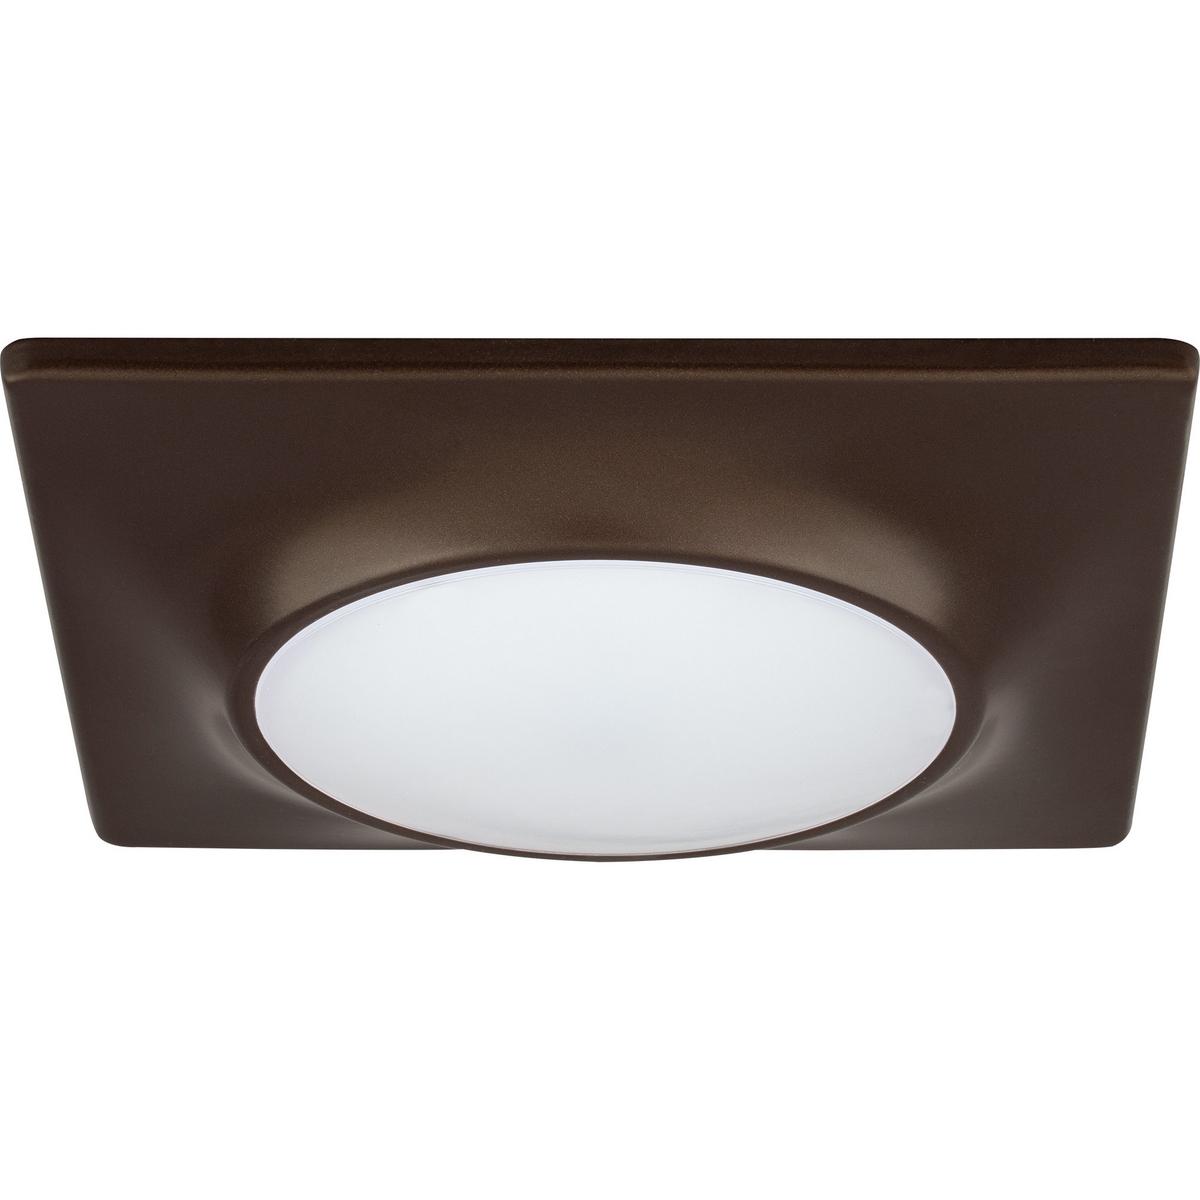 P8027-20/30K9-AC1-L10 PROGRESS LED 3000K TRIM BRZ